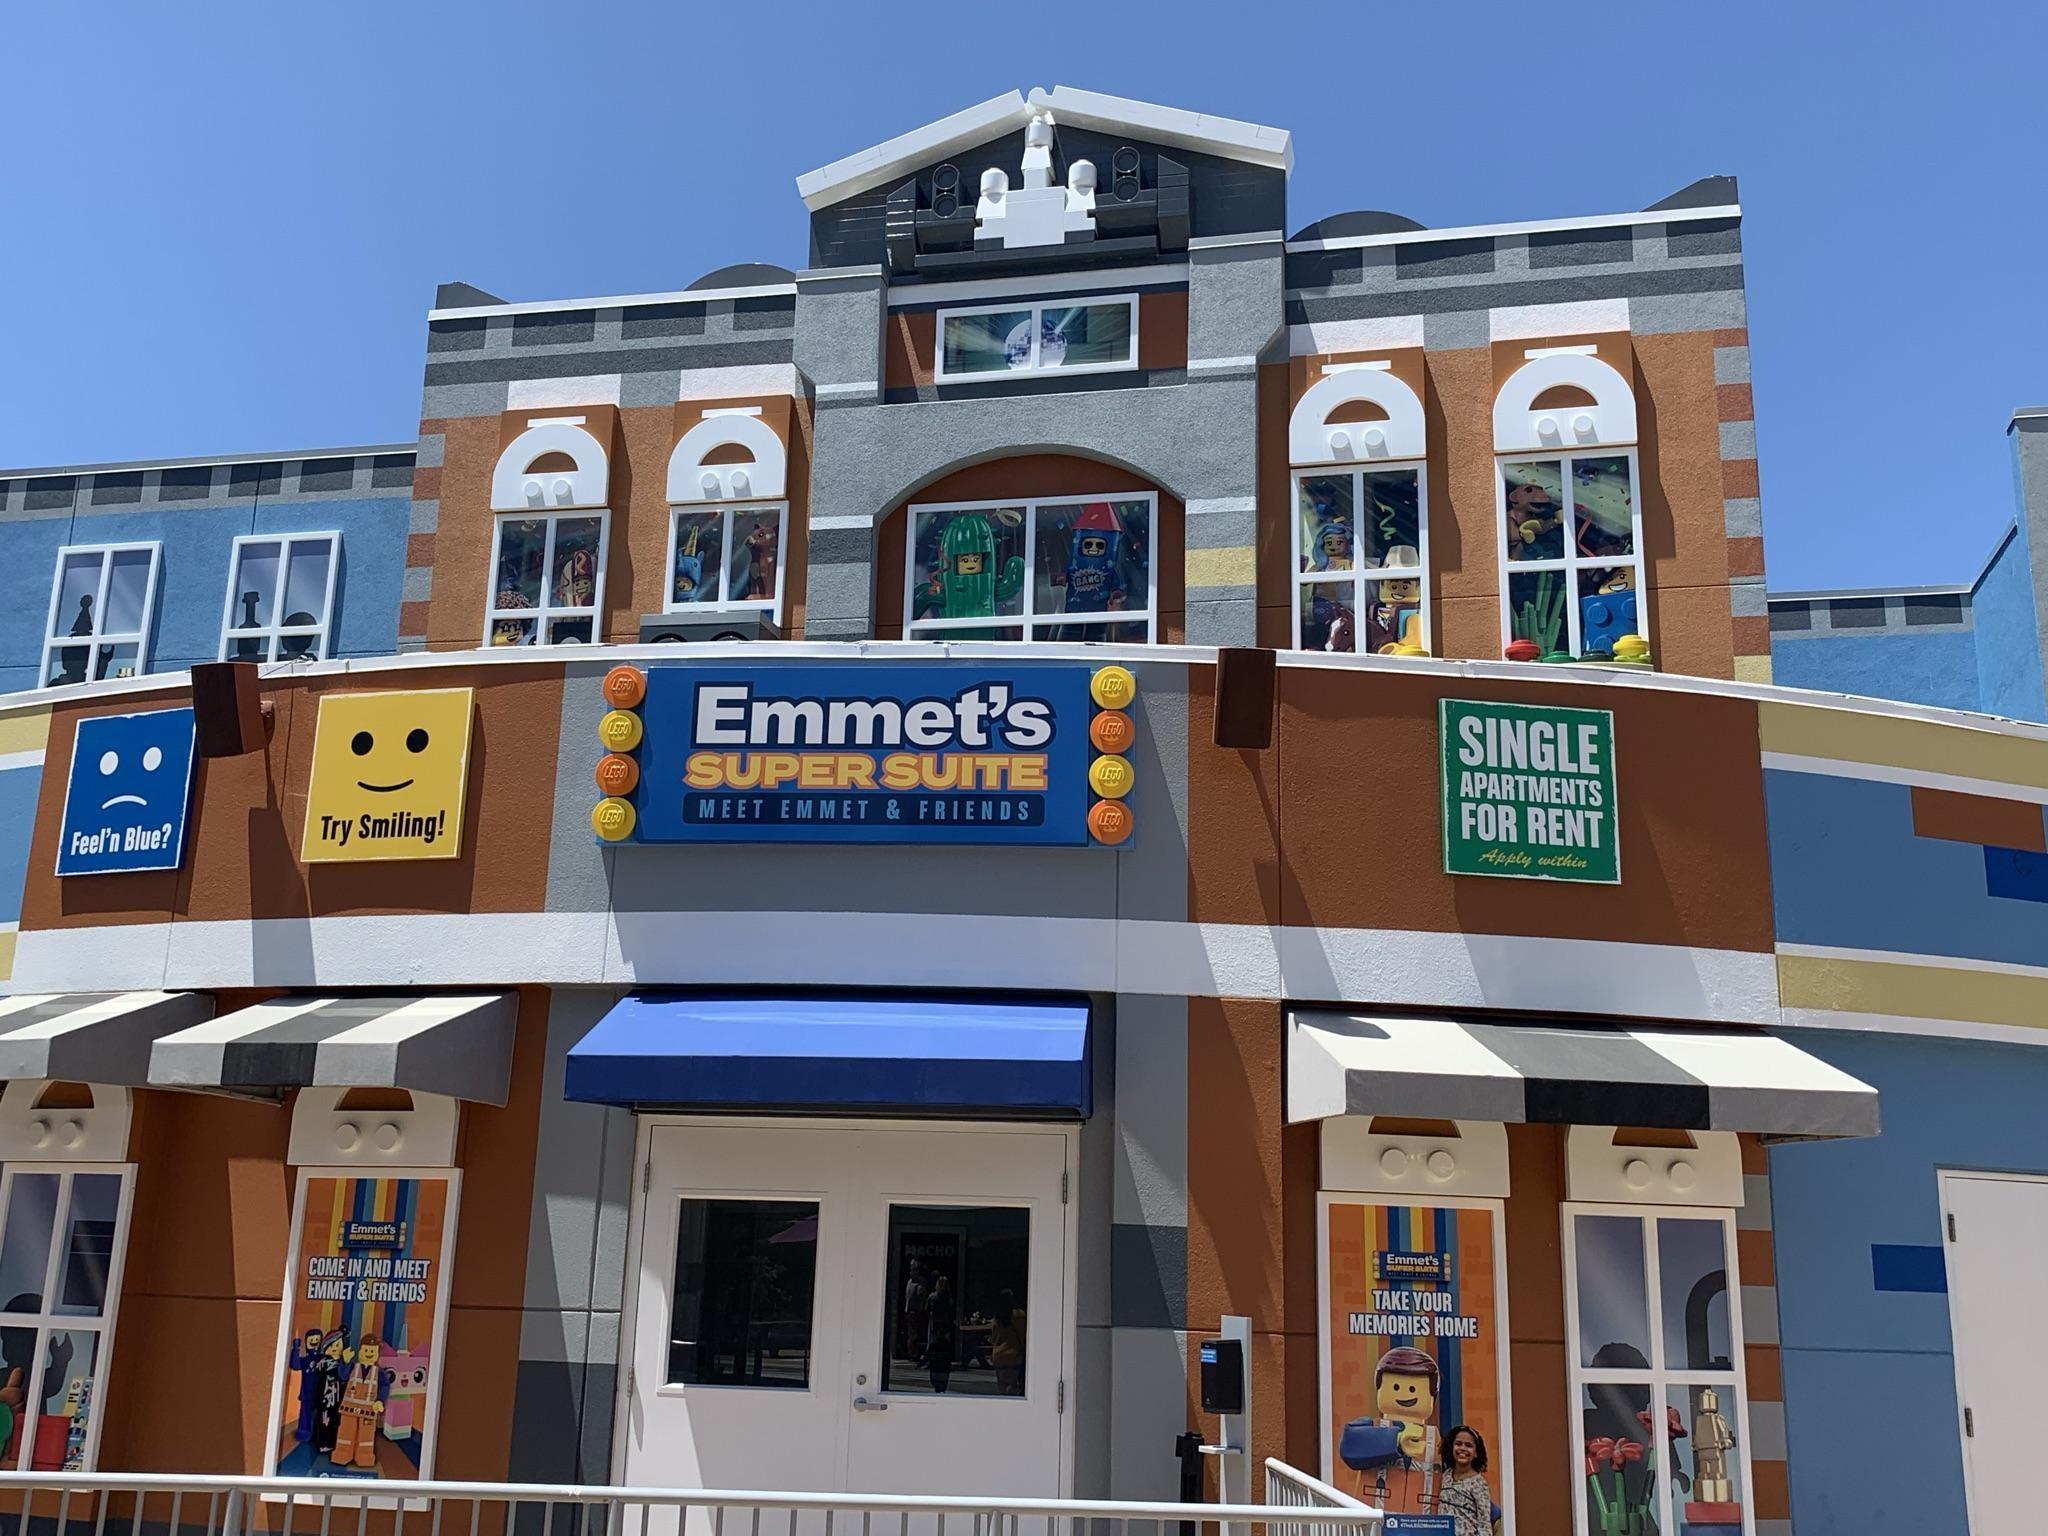 Legoland Emmet building